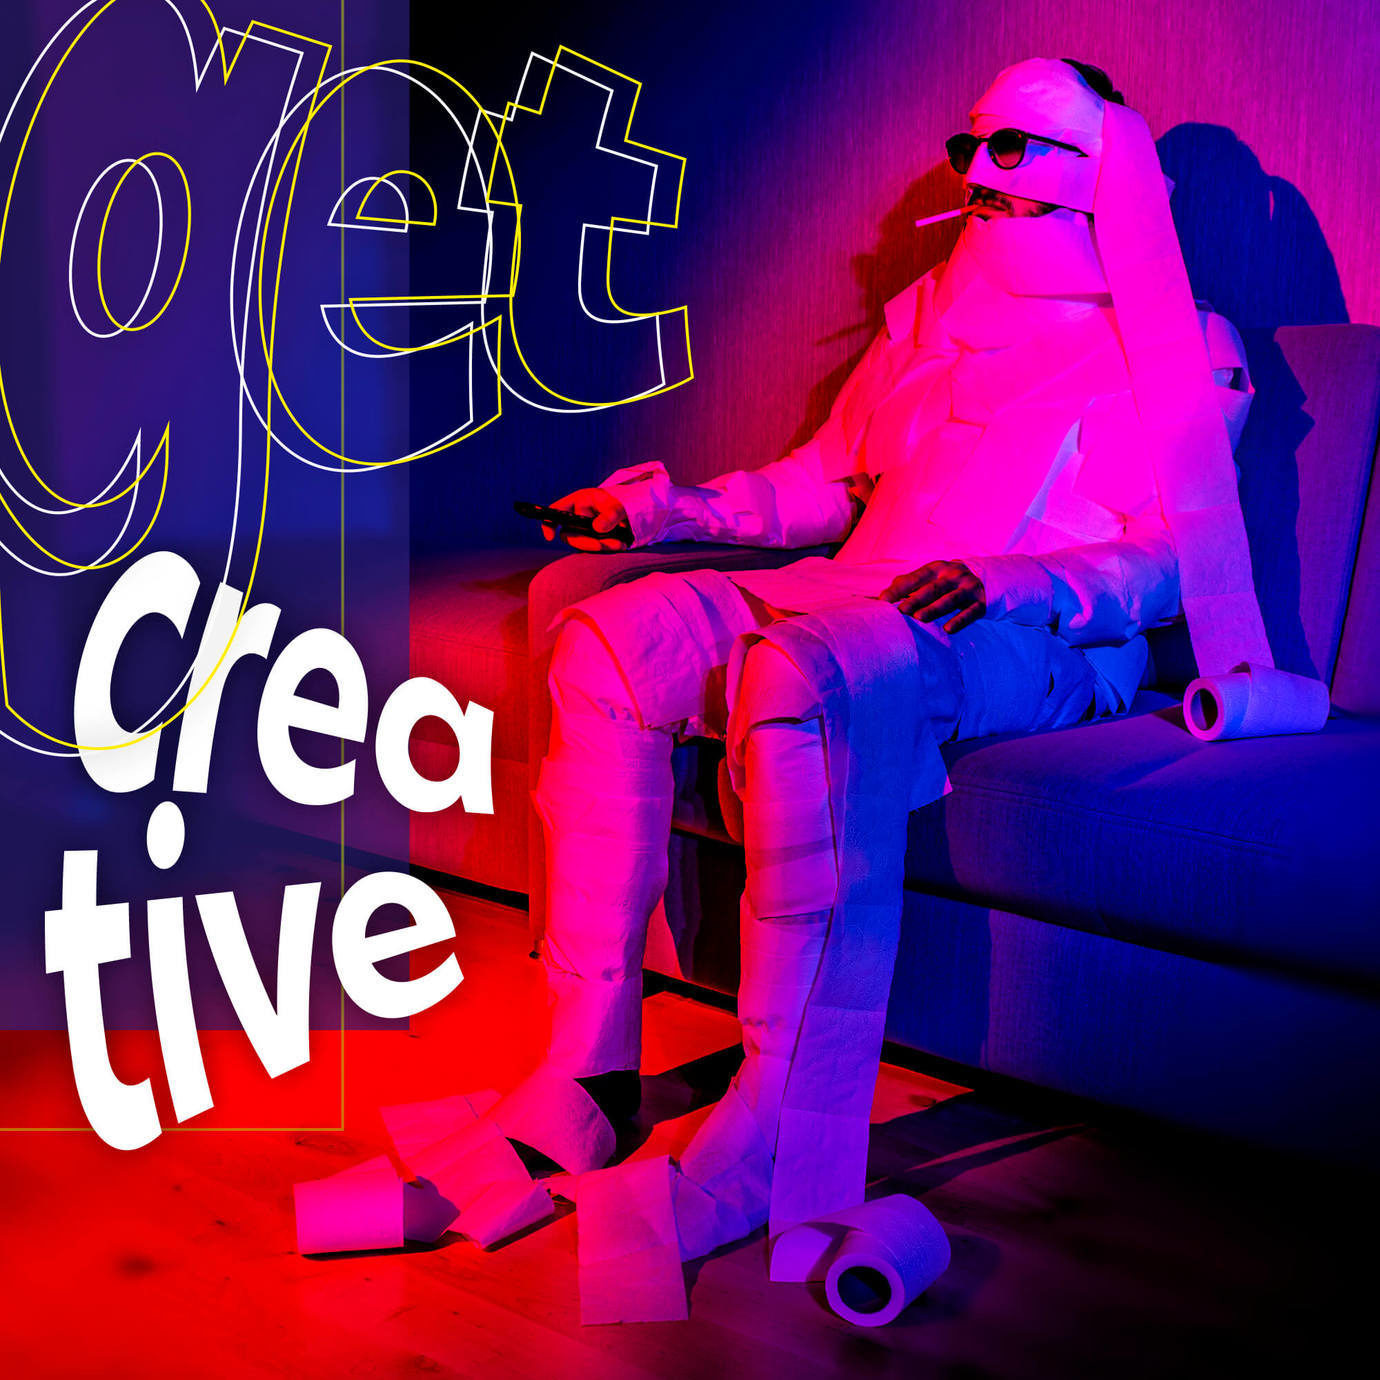 Grafikdesign / Derya Cubukcuoglu